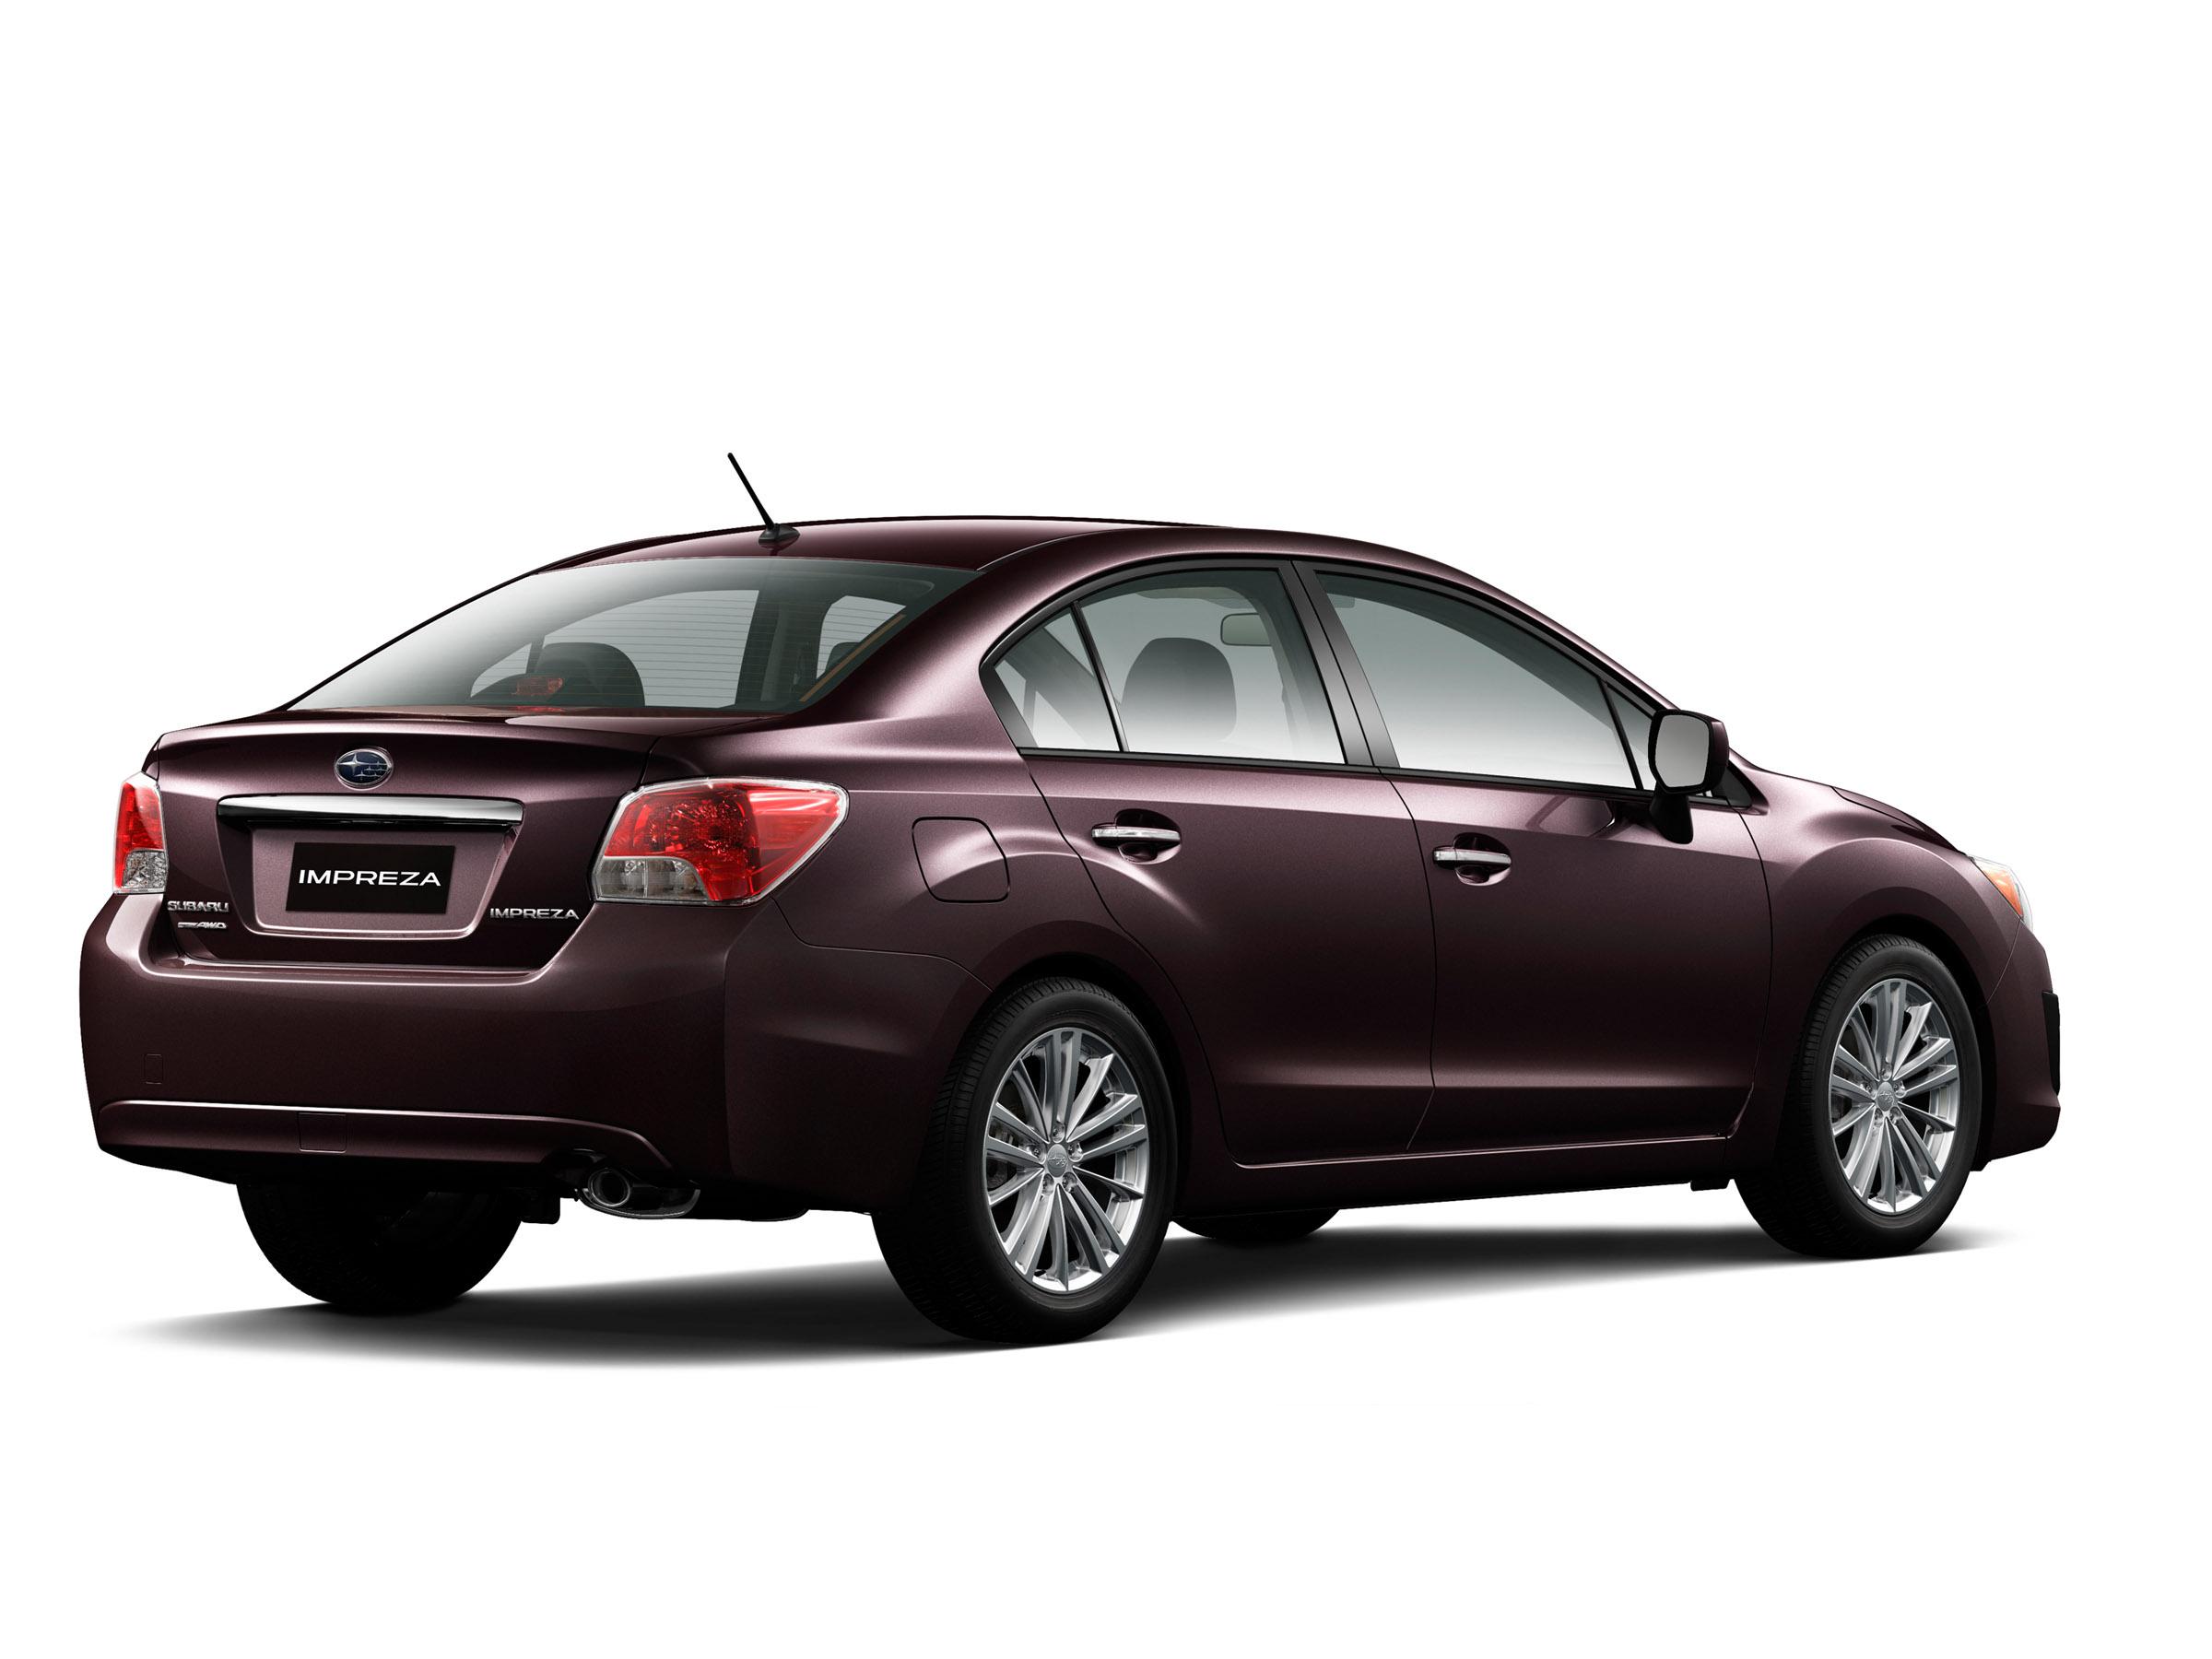 2012 - Subaru Impreza 2-0i лимитированная четвертая версия (фотографии) - фотография №6